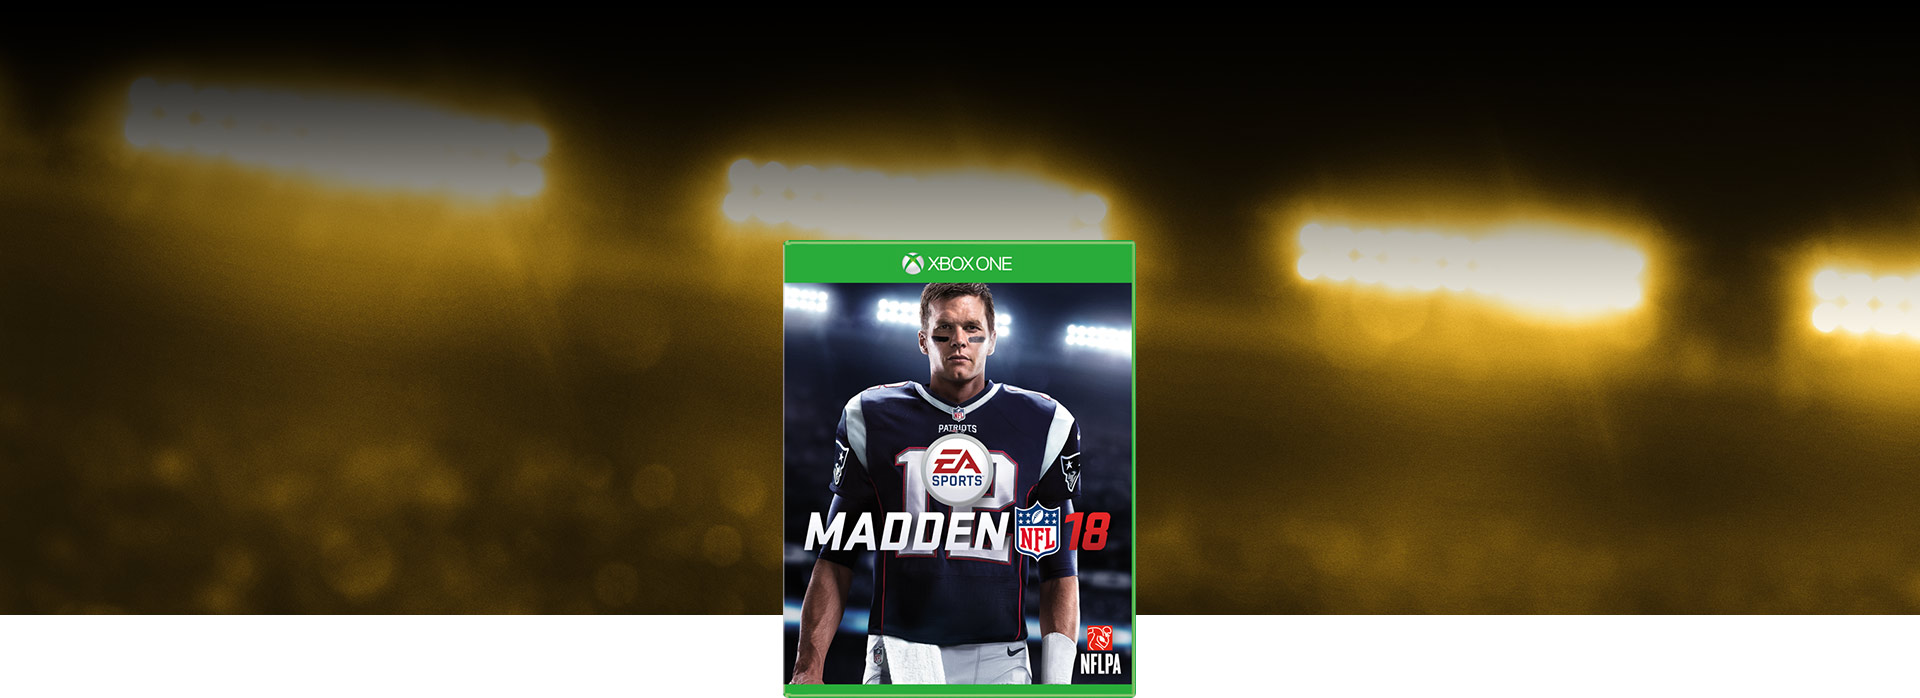 Madden NFL18 – Verpackung